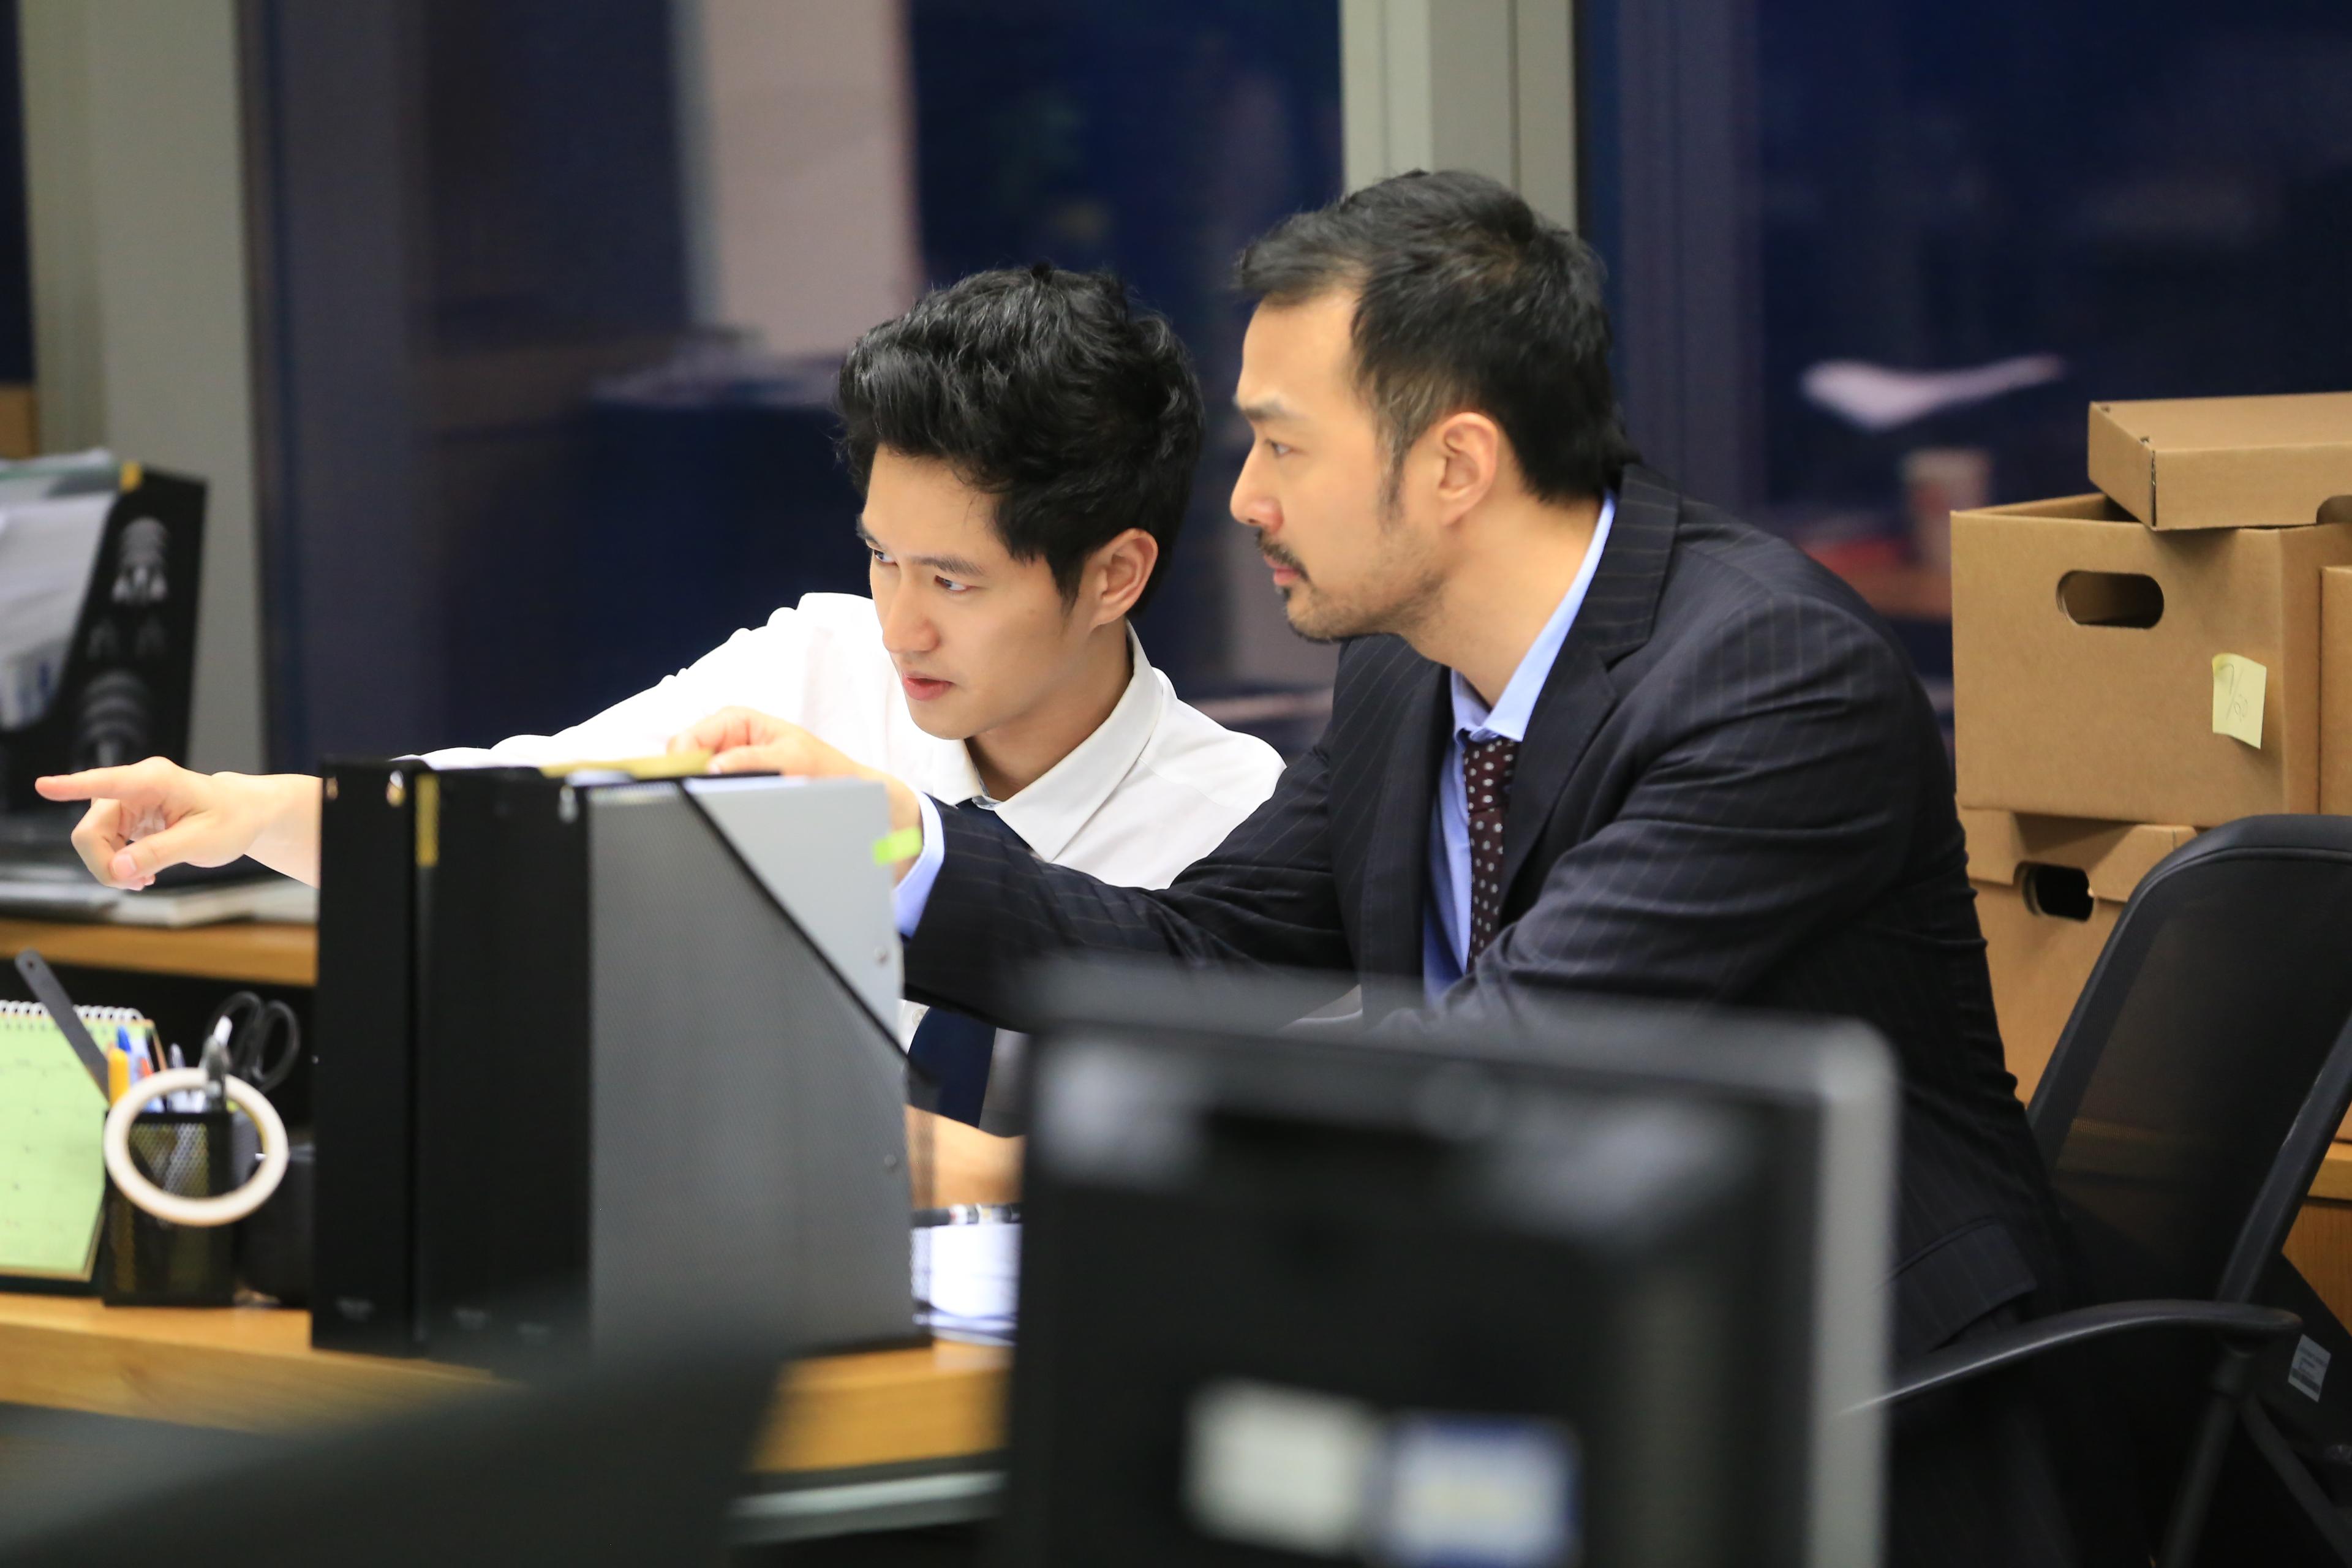 Simon Twu (涂世旻) (Twu Shih Min) in the film One Day